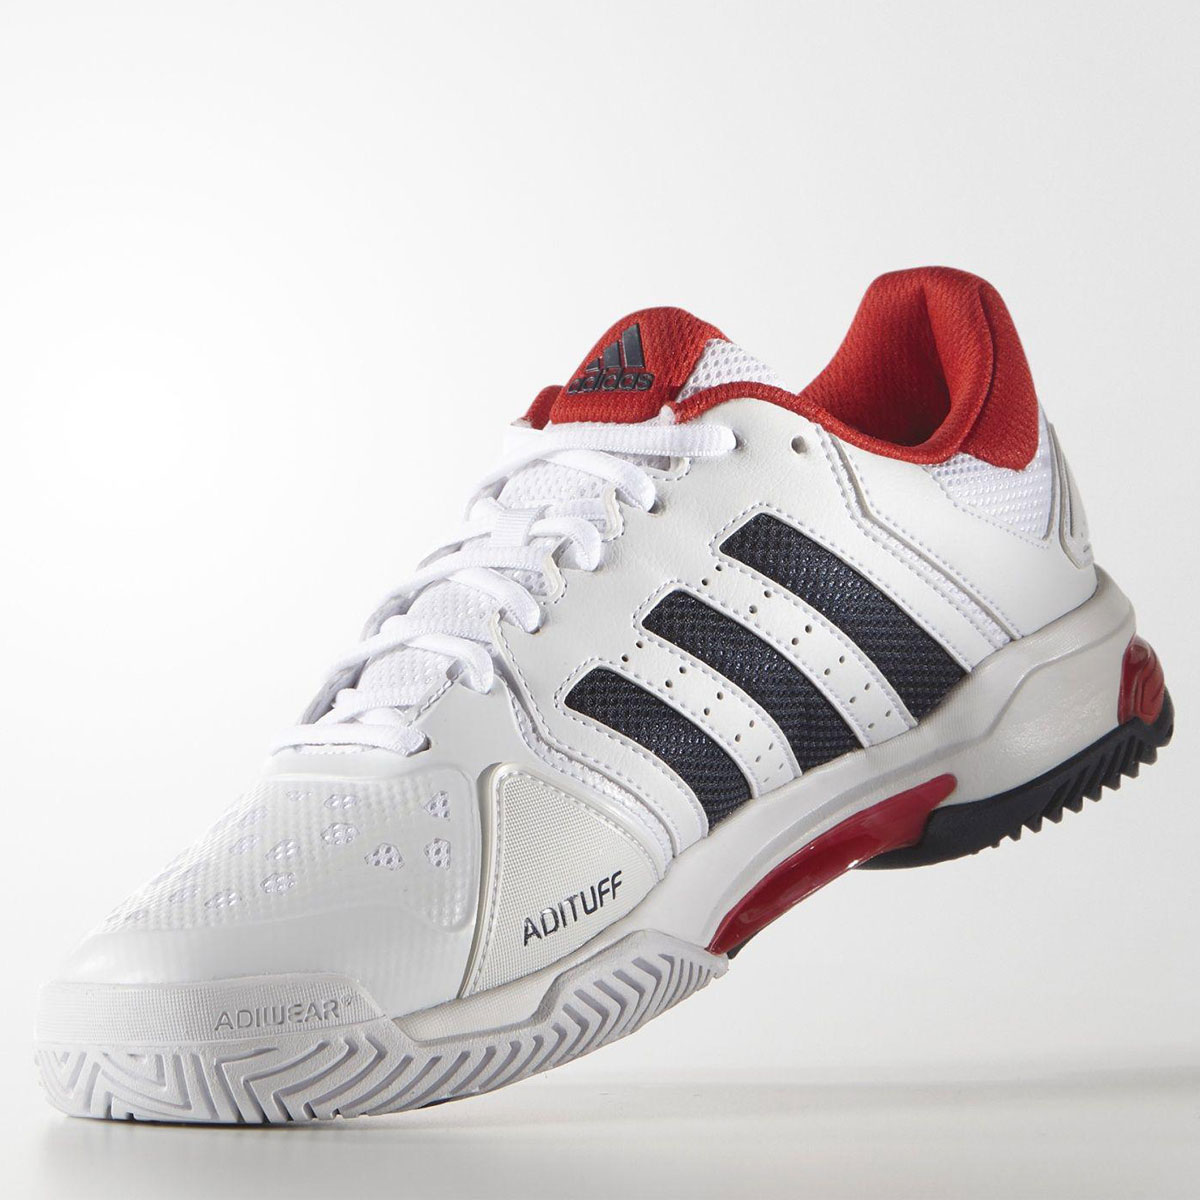 aacda7f12aa adidas Performance Mens Barricade Club Tennis Shoes (AQ2287) rrp£65 ...